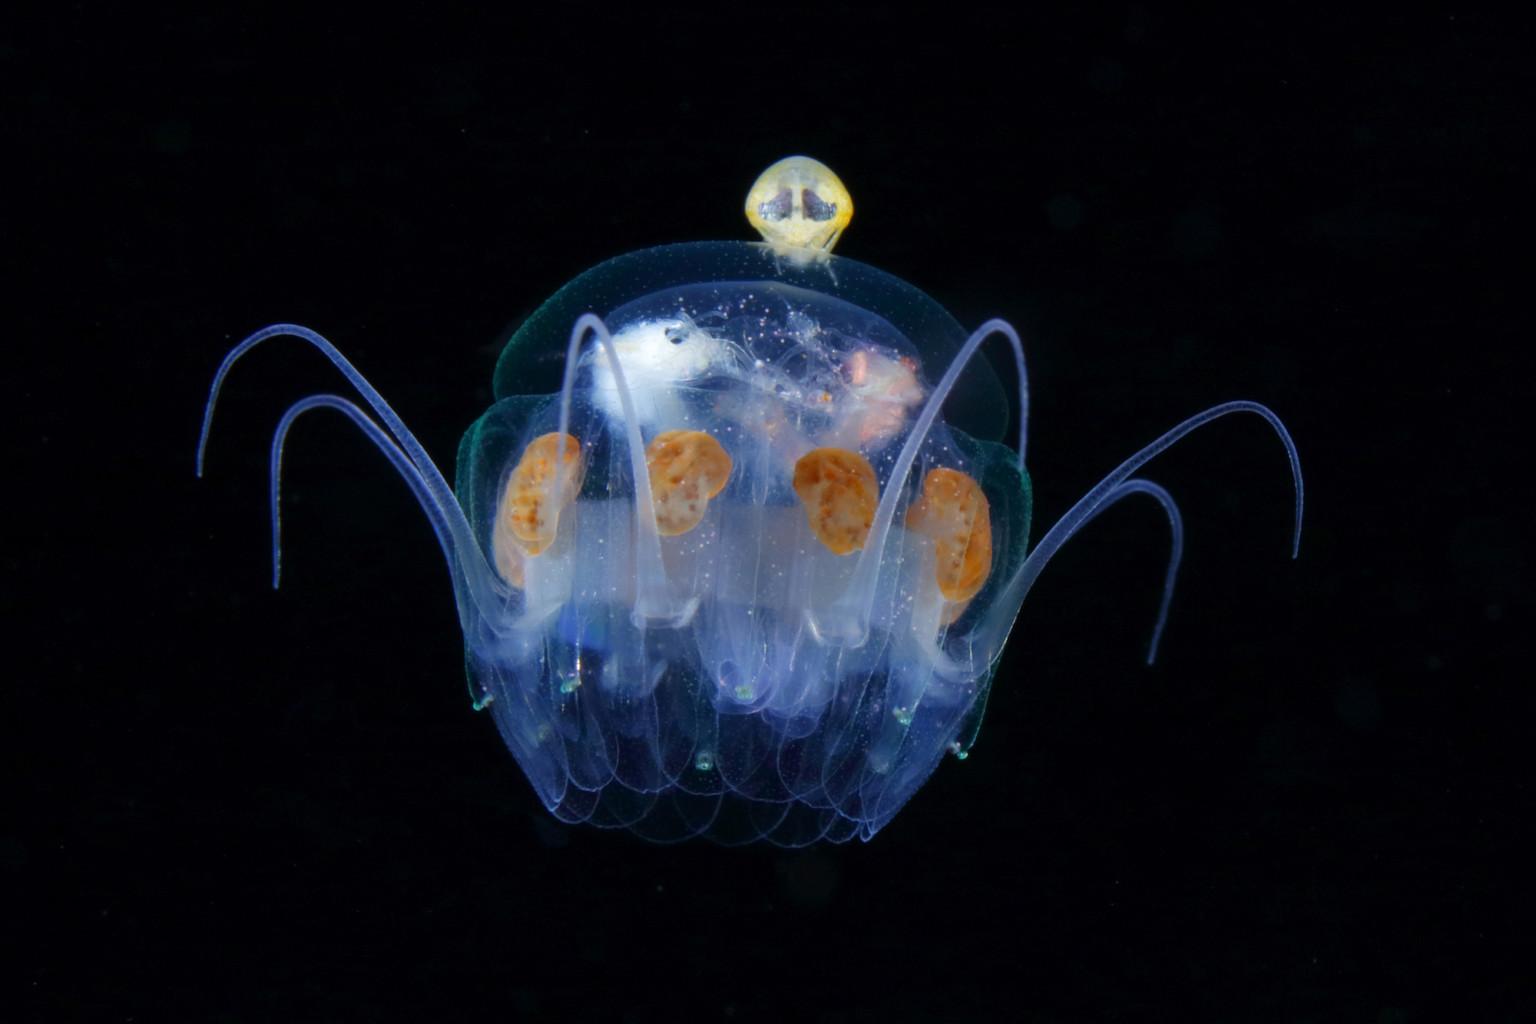 Hyperiidea riding the jellyfish. It's lke an alien maneuvering a spaceship/Jellyfish umbrella width 20mm